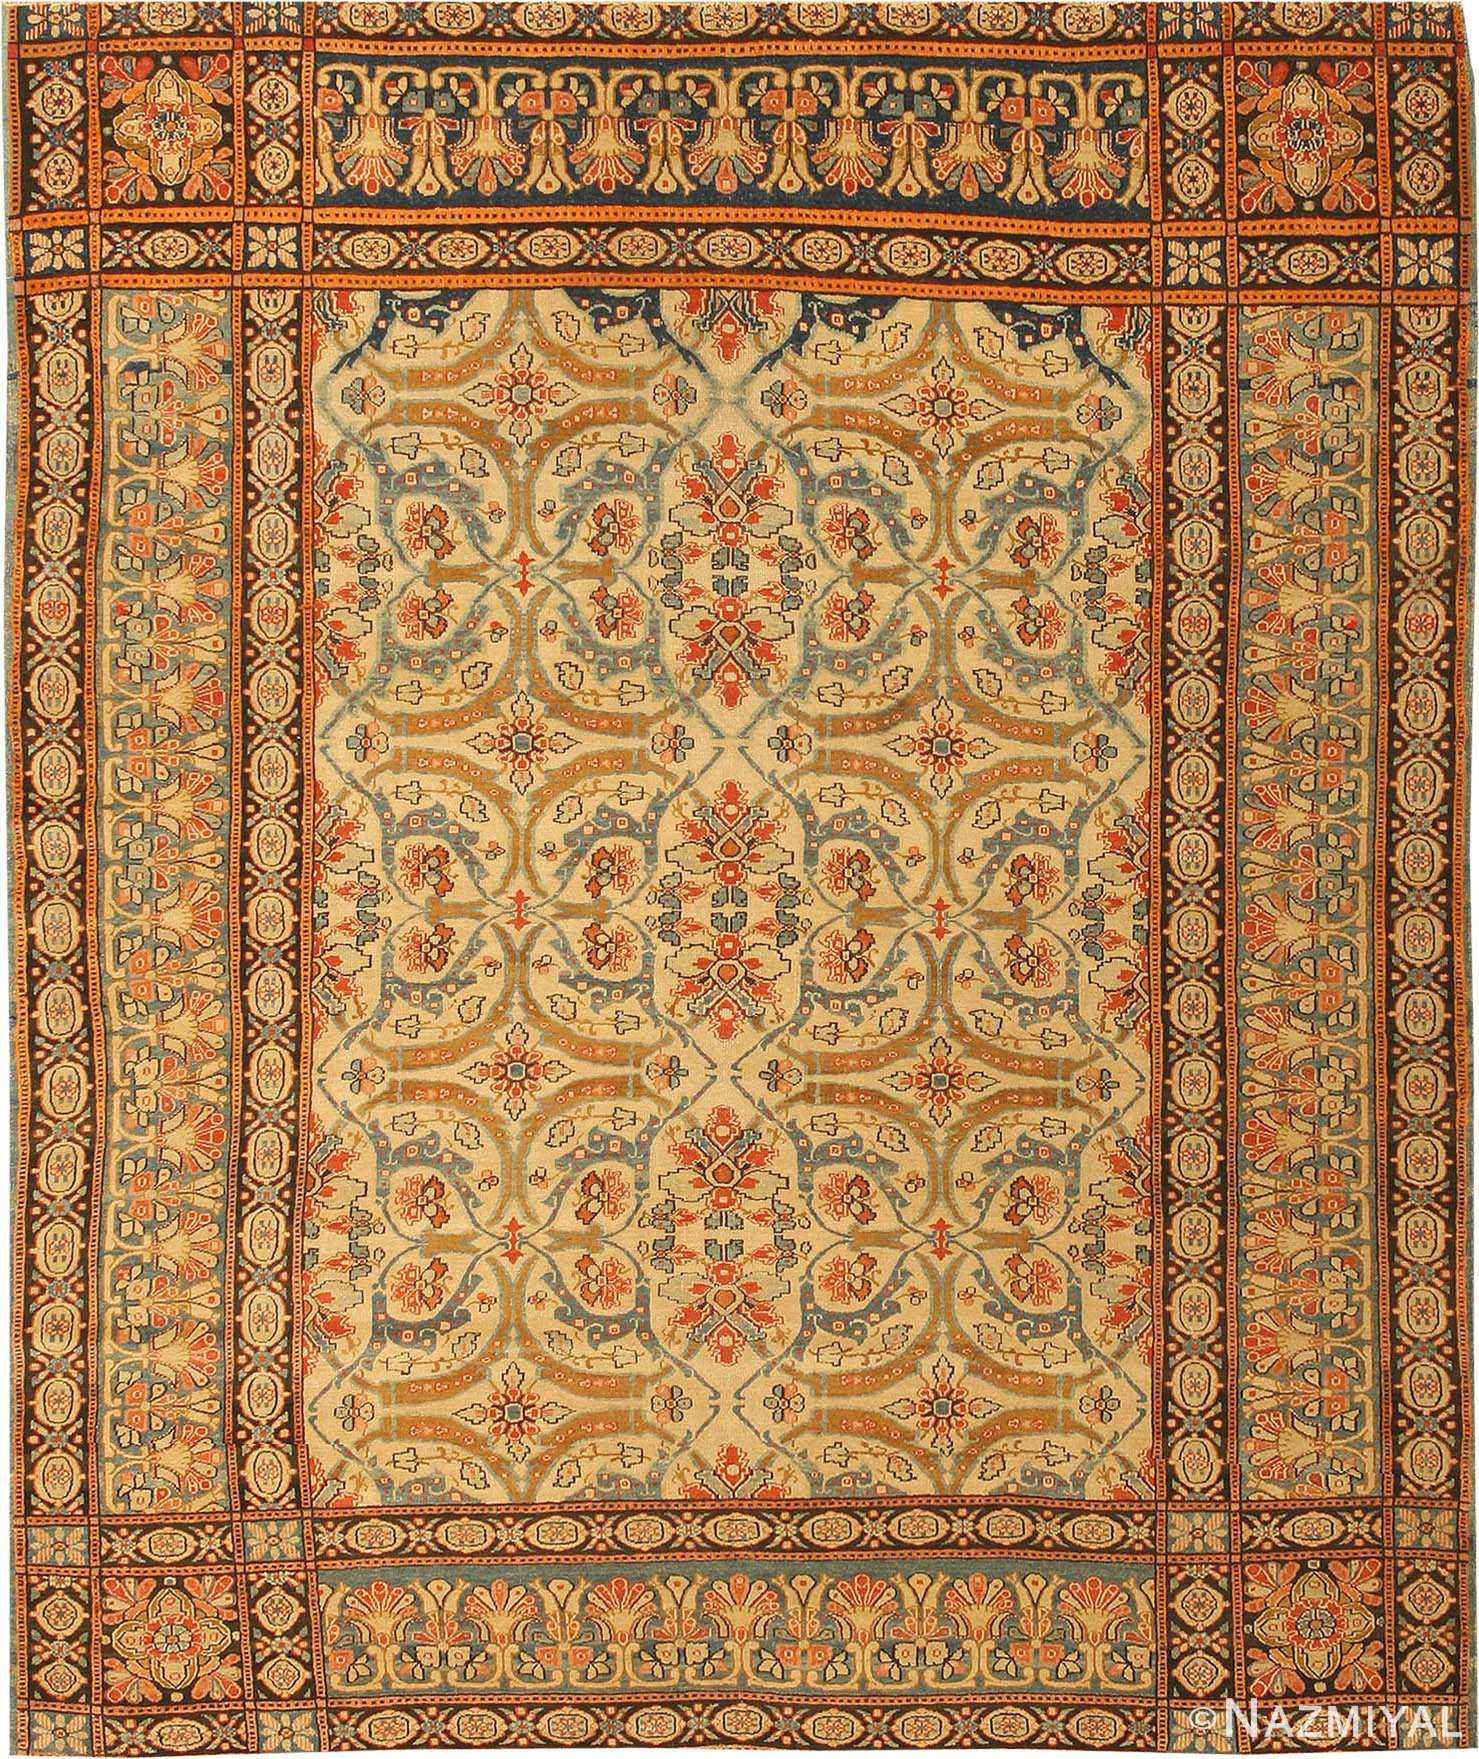 Vintage Persian Rugs: Antique Senneh Persian Rugs 41357